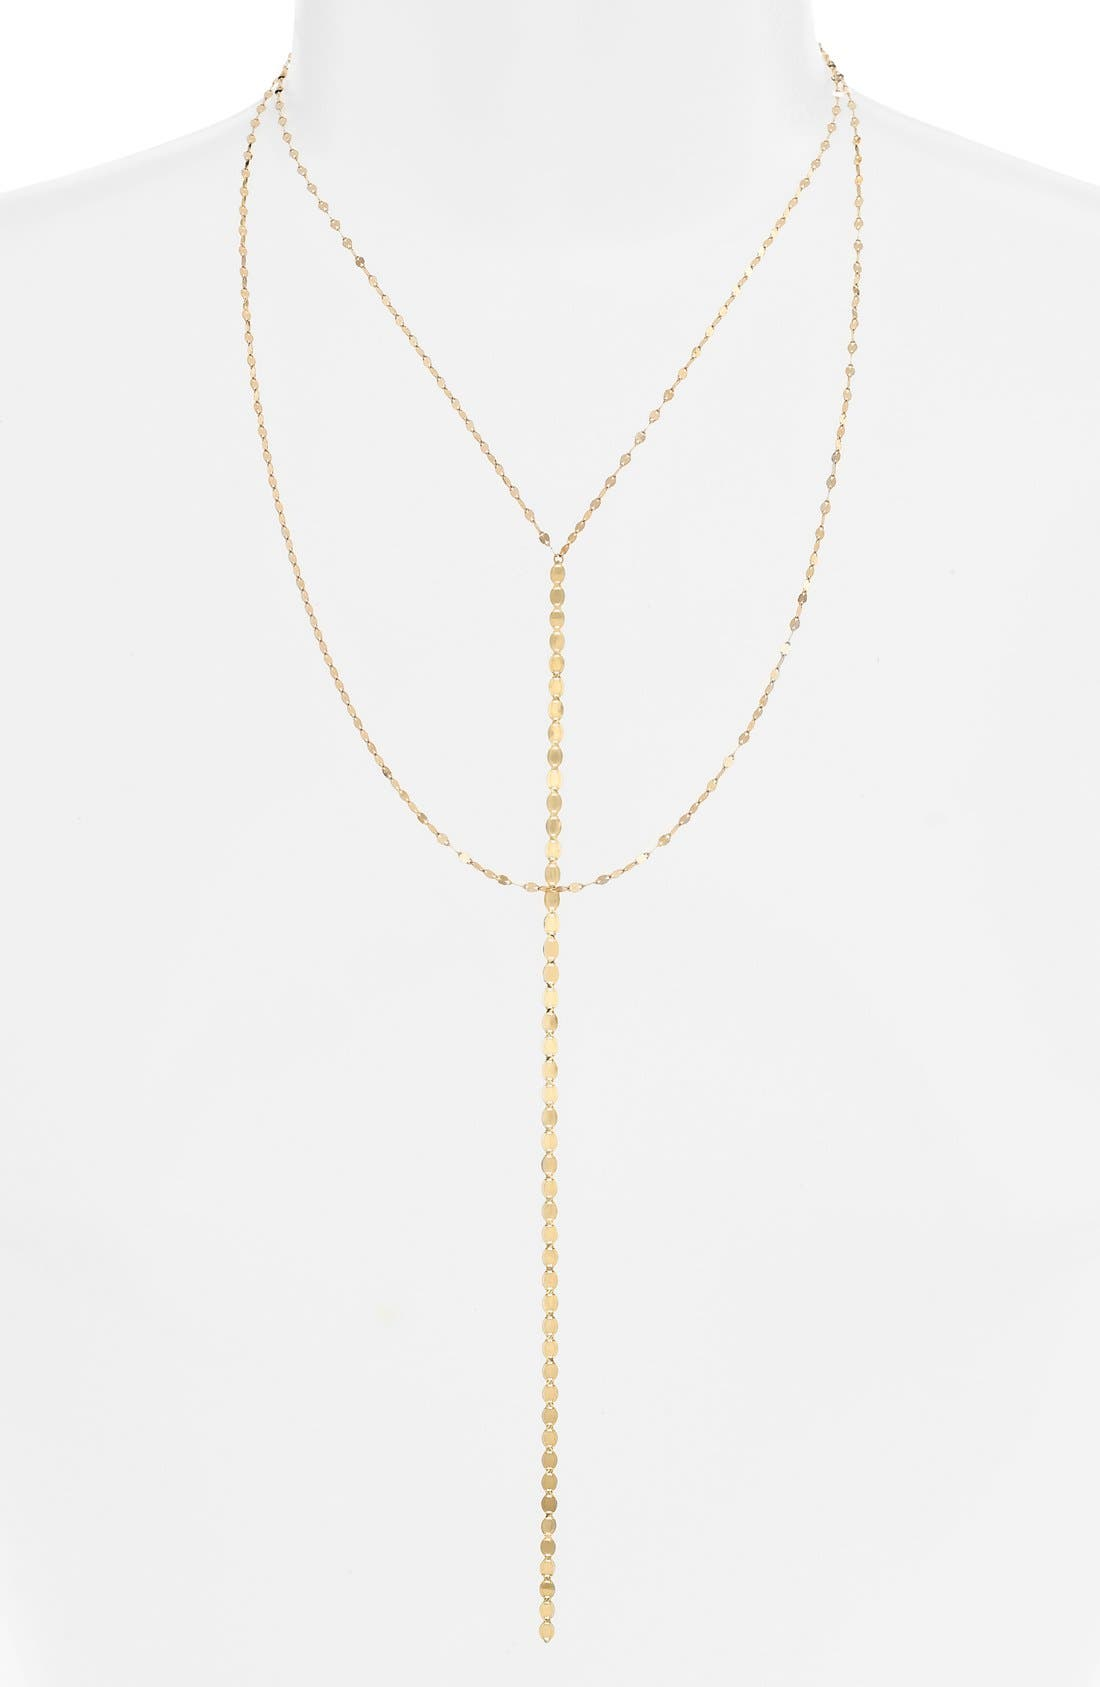 LANA JEWELRY Nude Blake Multistrand Drop Necklace